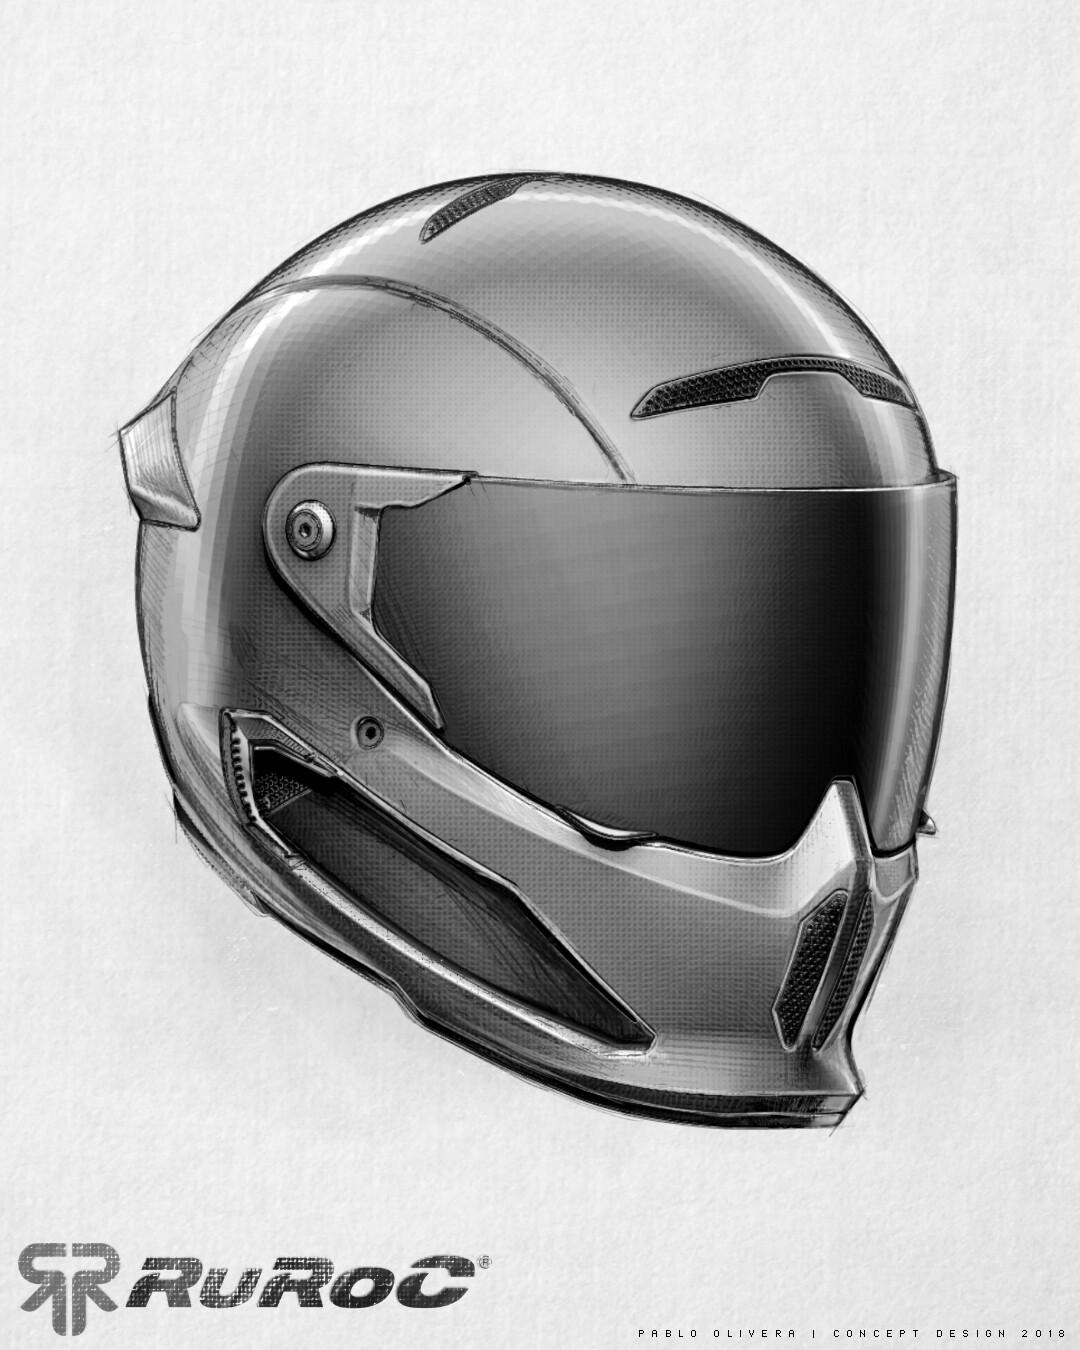 Pablo olivera helmet ruroc limited edition drawing sketch atlas